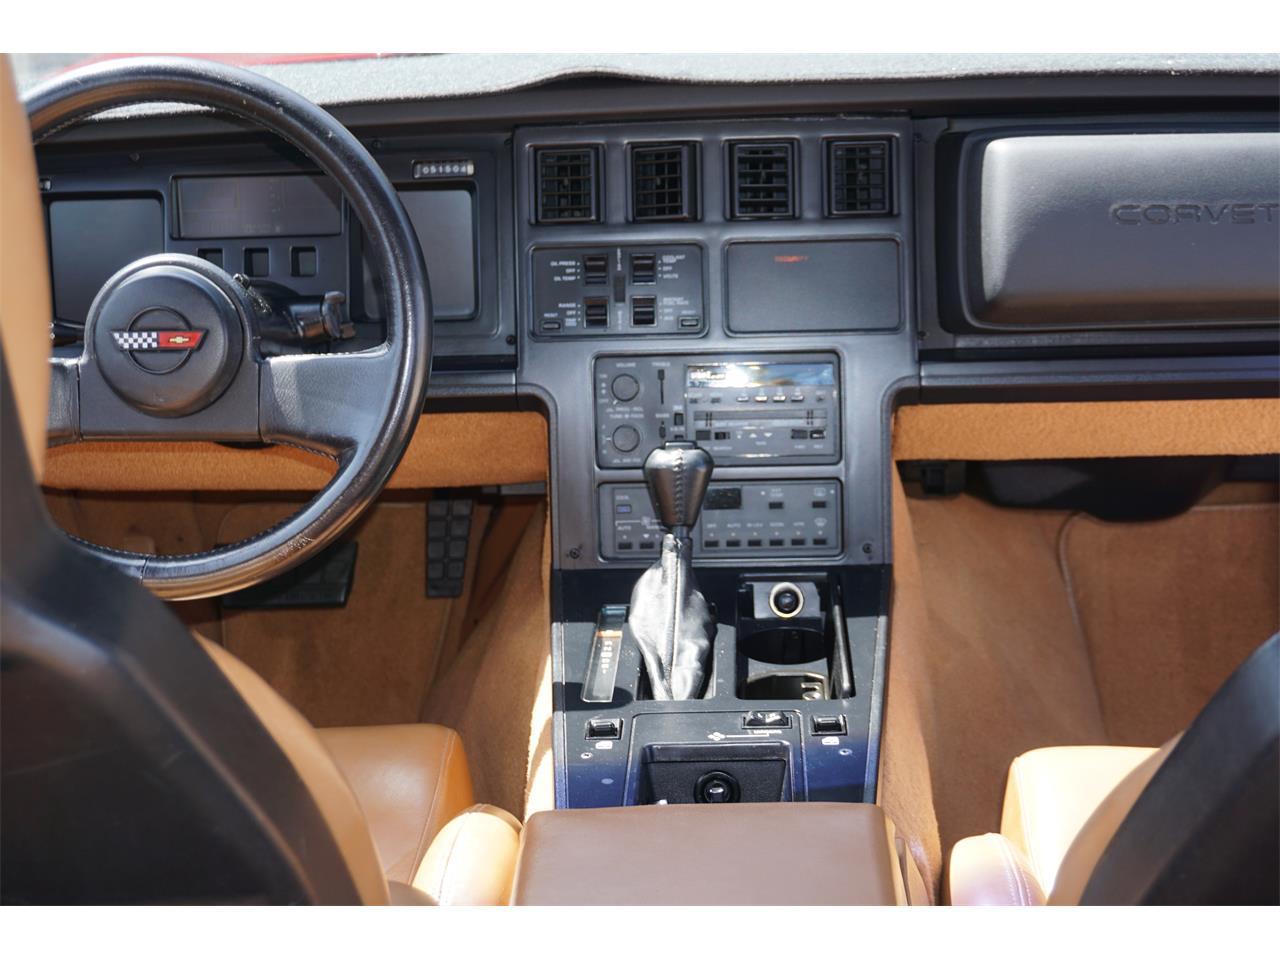 Large Picture of '89 Chevrolet Corvette C4 located in Grand Junction Colorado - $9,500.00 - QTU6